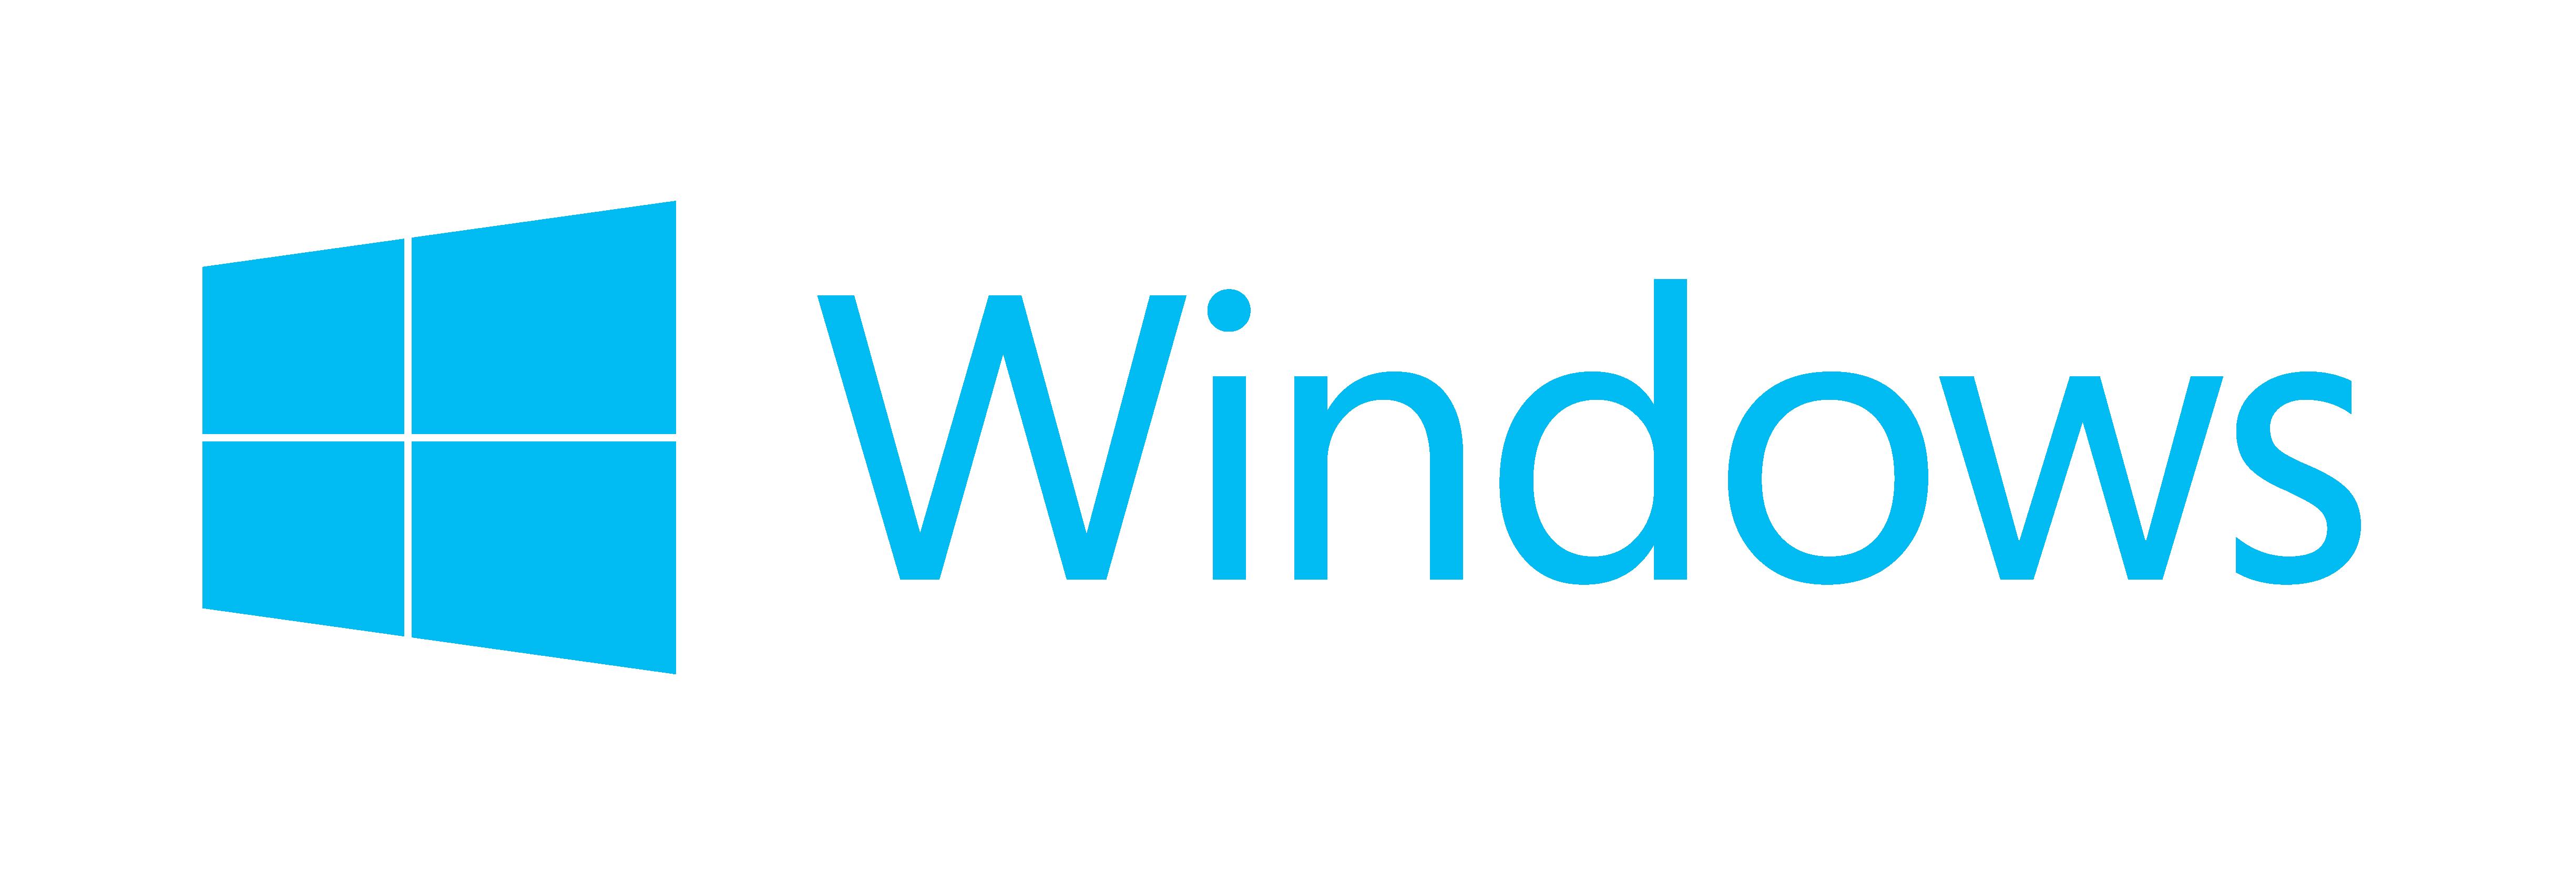 Windows Customer Service Complaints Department